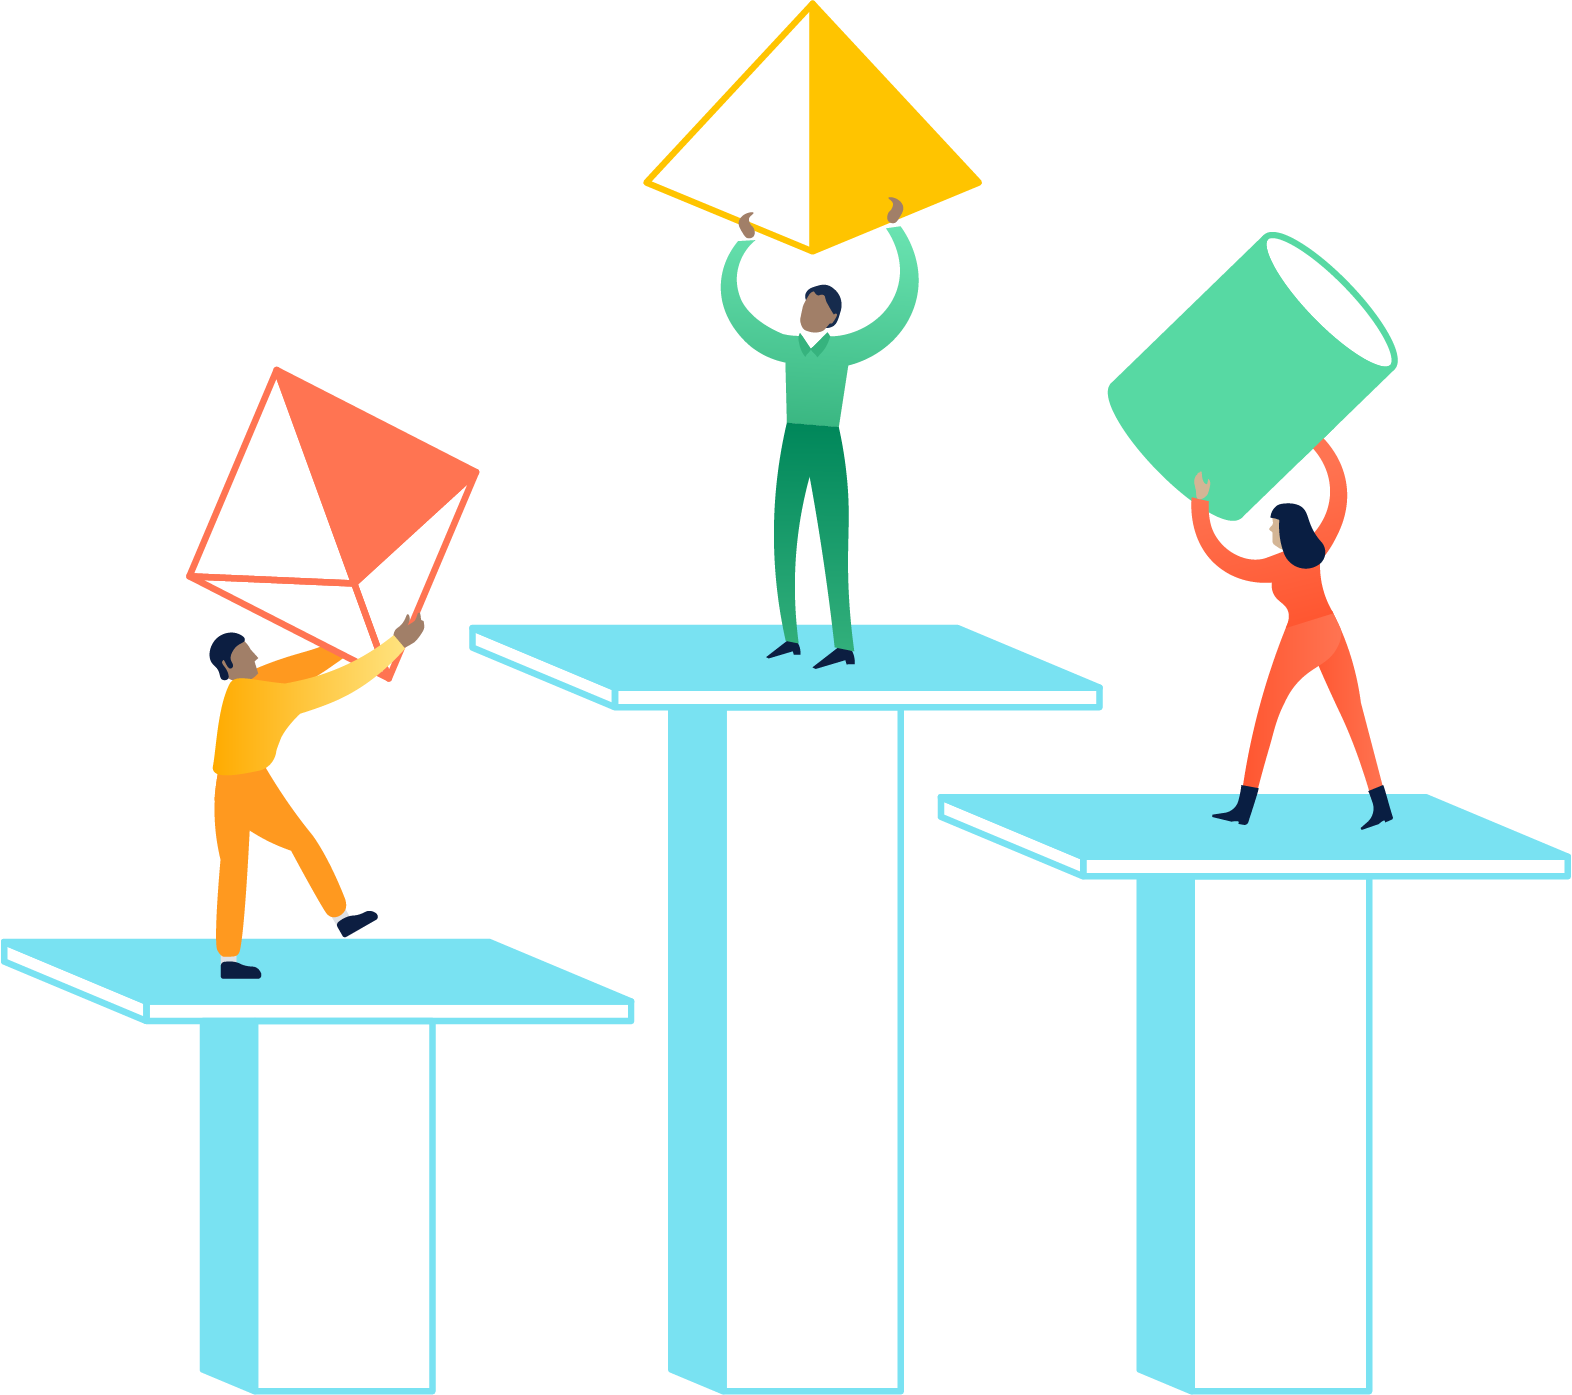 Les cinqsecrets des équipes informatiques ultra performantes